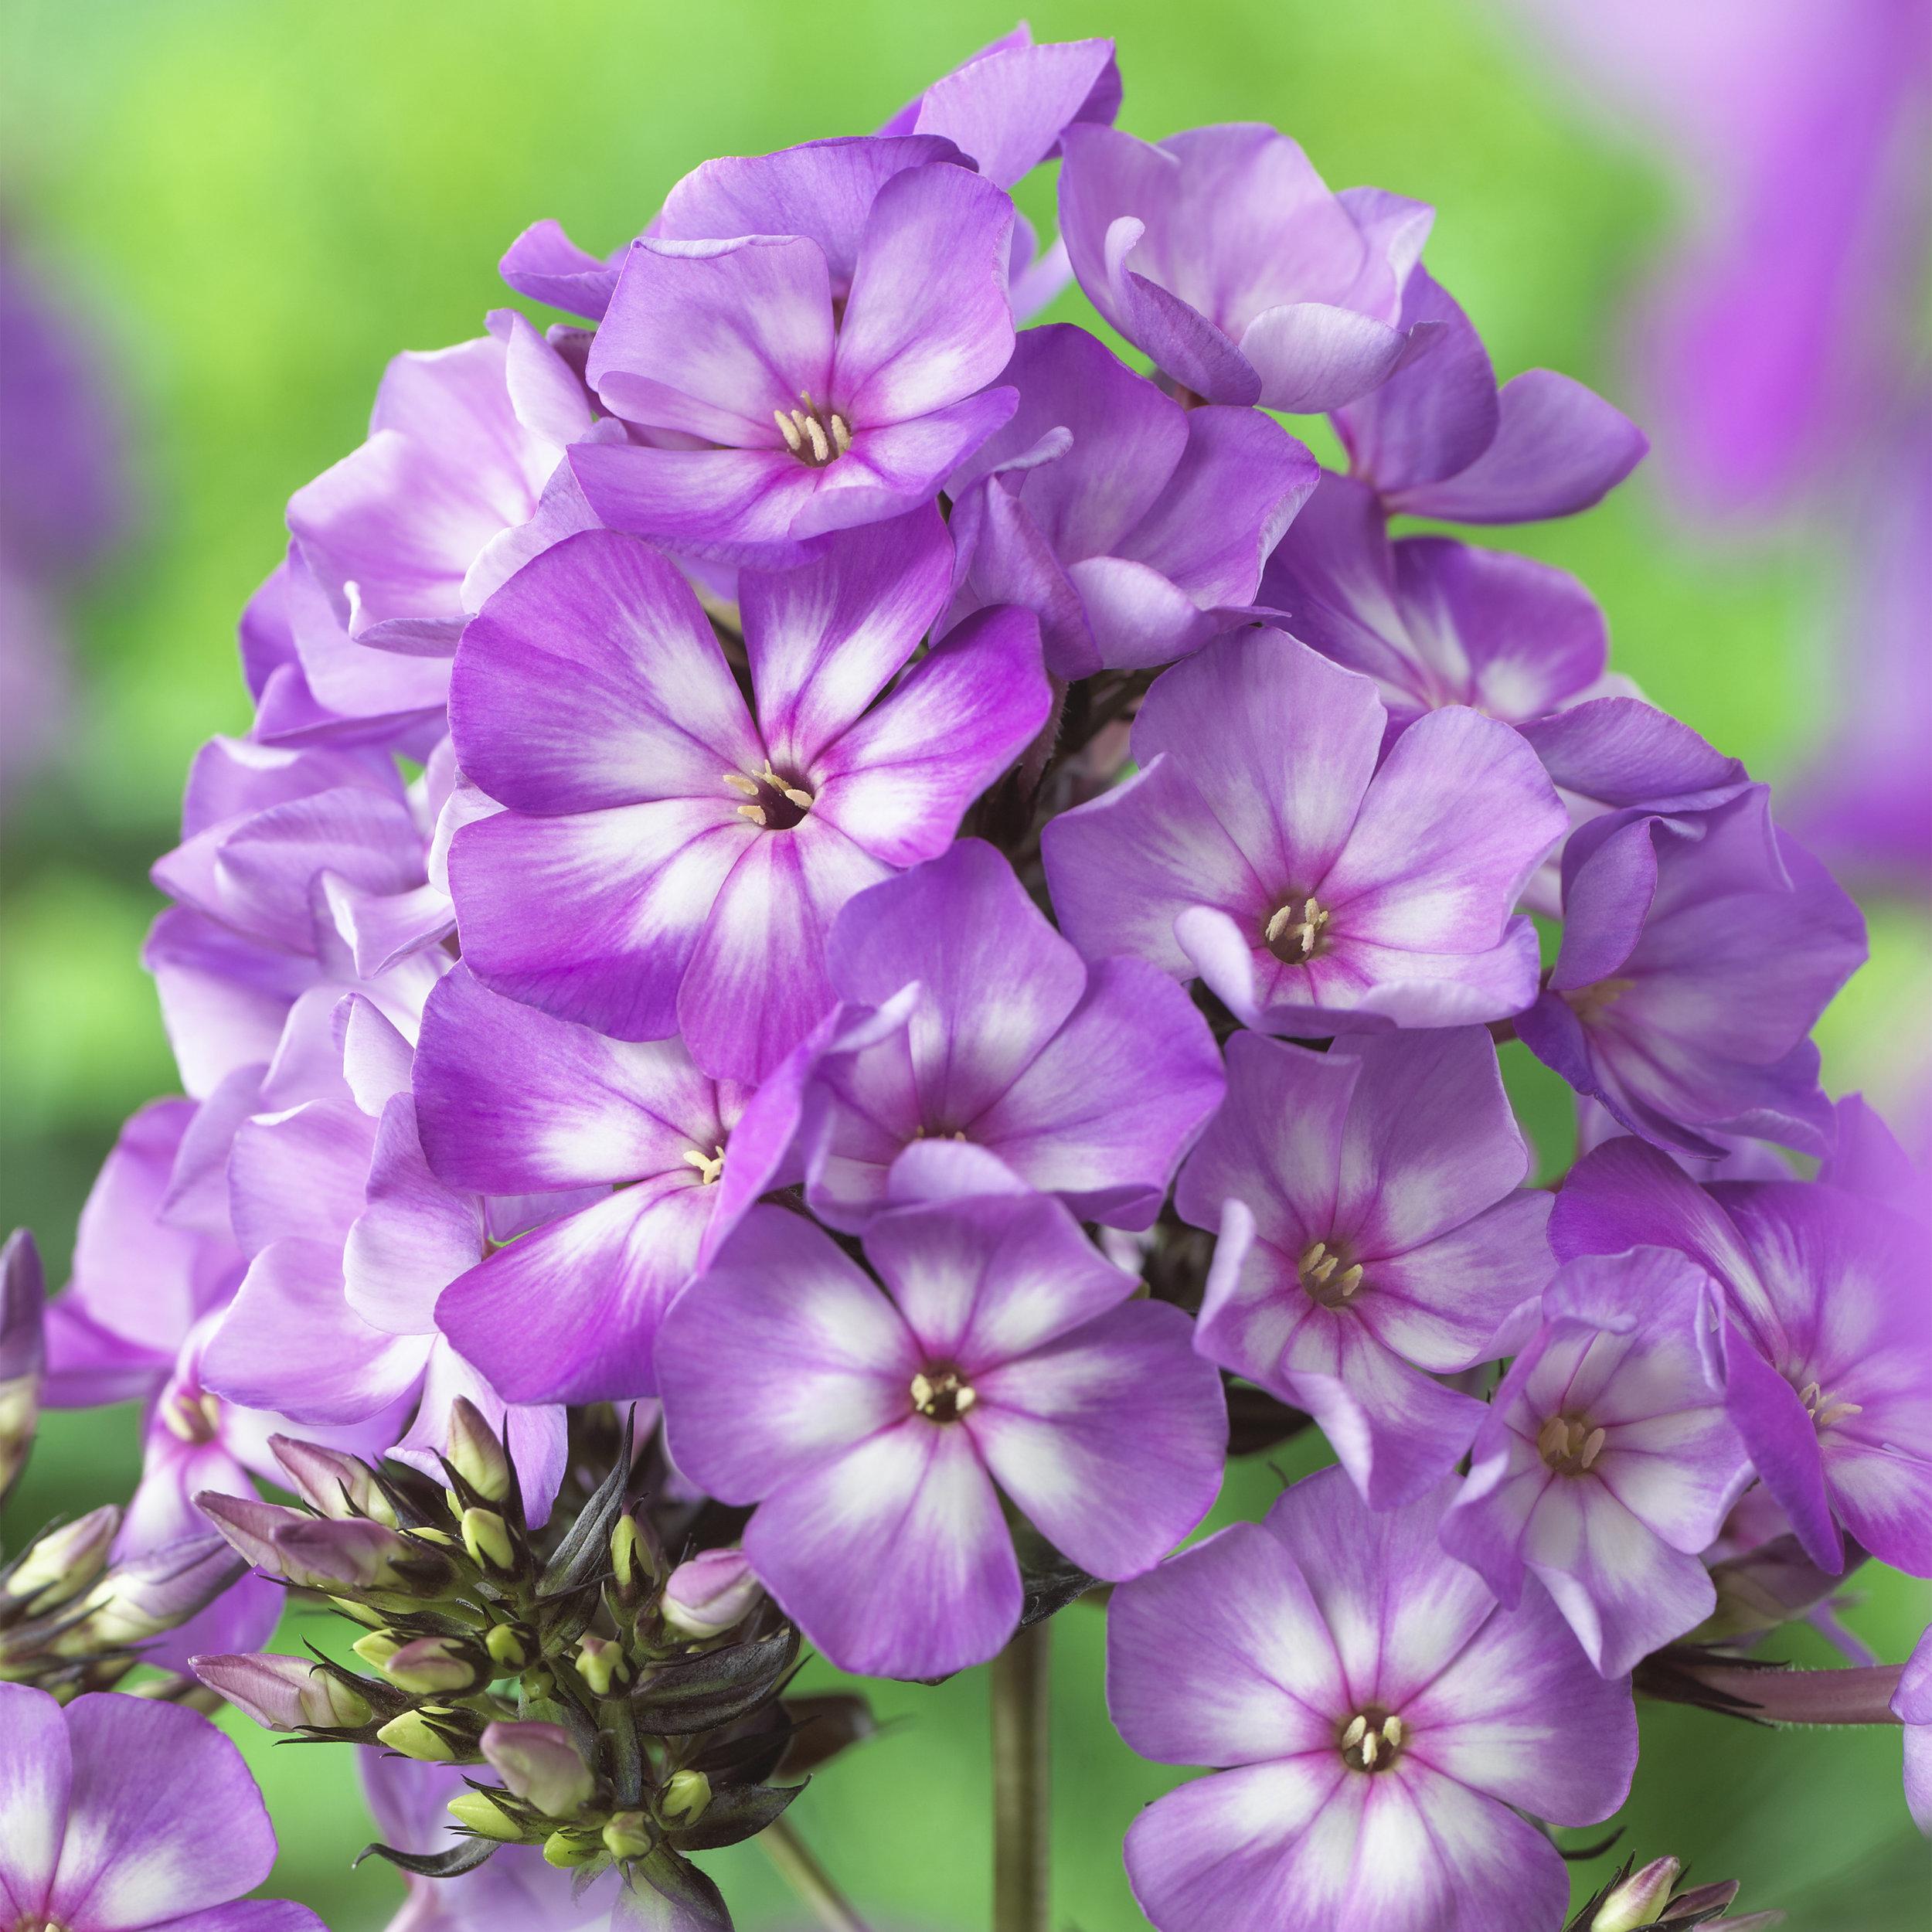 HR_Vegetative_Phlox_Sweet_Summer_Sweet_Summer_Surprise__Violet_White_70028360_1.jpg